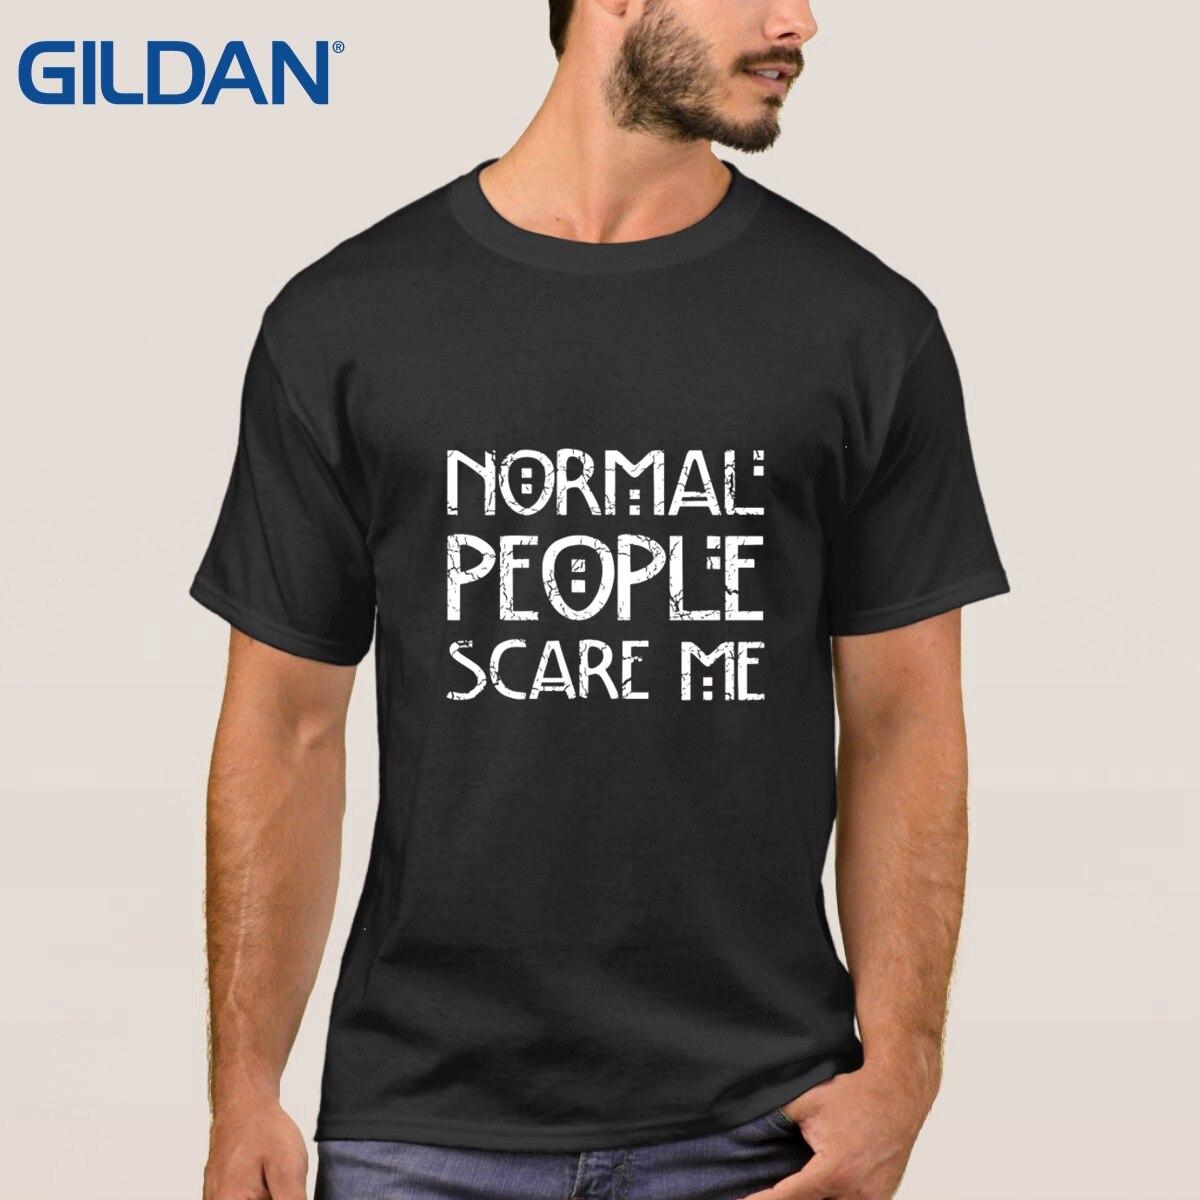 Black t shirt bulk - Crazy Black Men S Ali T Shirts In Bulk Normal People Scare Me Autism Awareness Size Tee